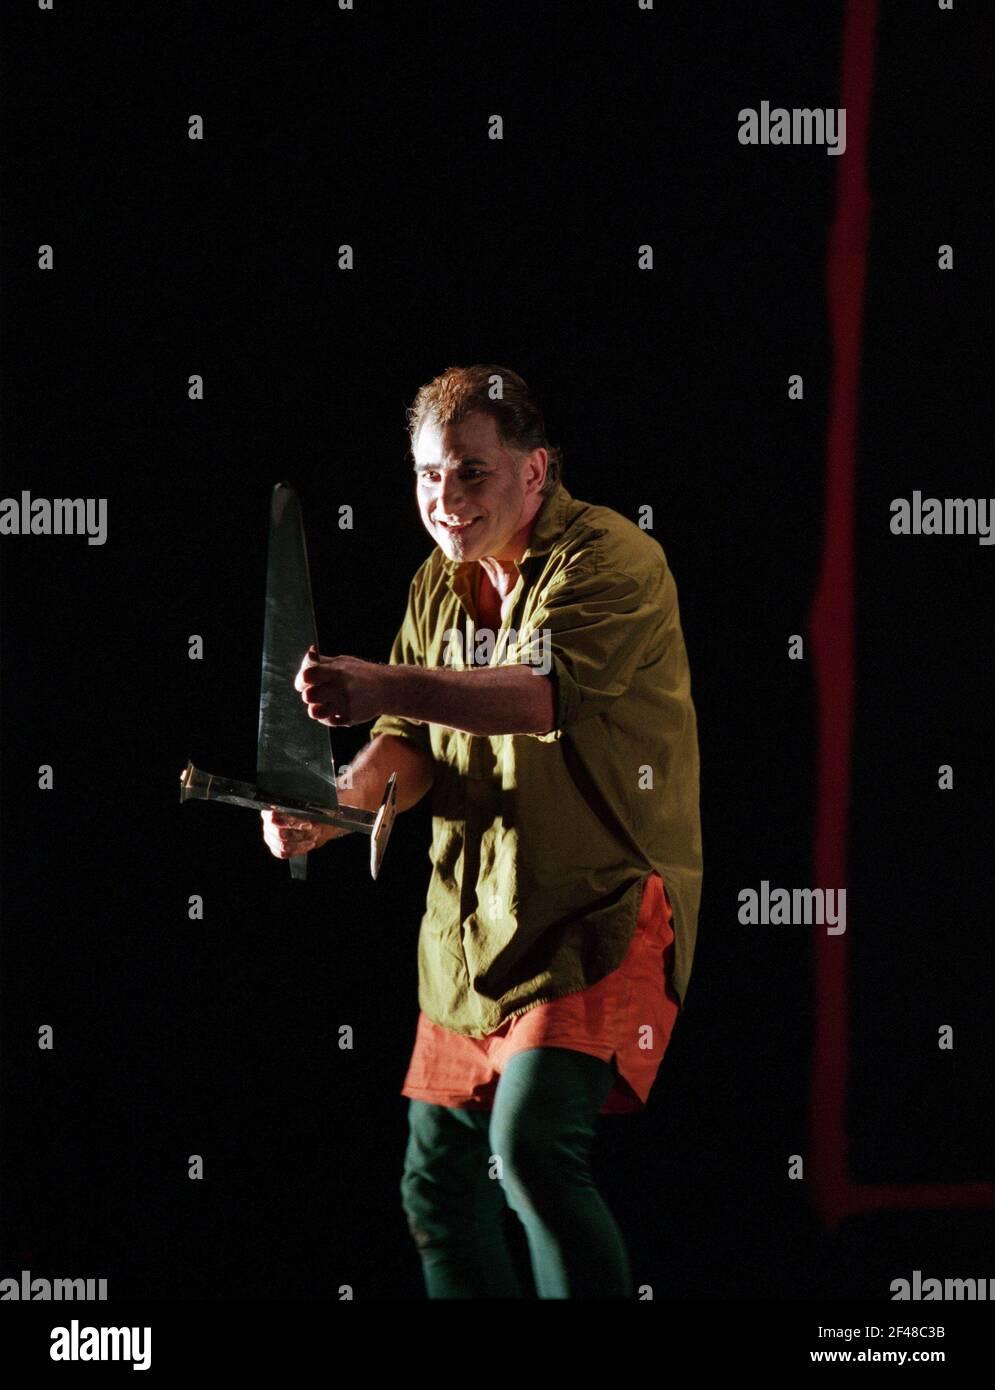 Siegfried Jerusalén (Siegfried) en SIEGFRIED por Wagner en la Royal Opera, Covent Garden, Londres WC2 27/03/1995 director: Bernard Haitink diseño: Nigel Lotería iluminación: Pat Collins movimiento: Matthew Hamilton director: Richard Jones Foto de stock